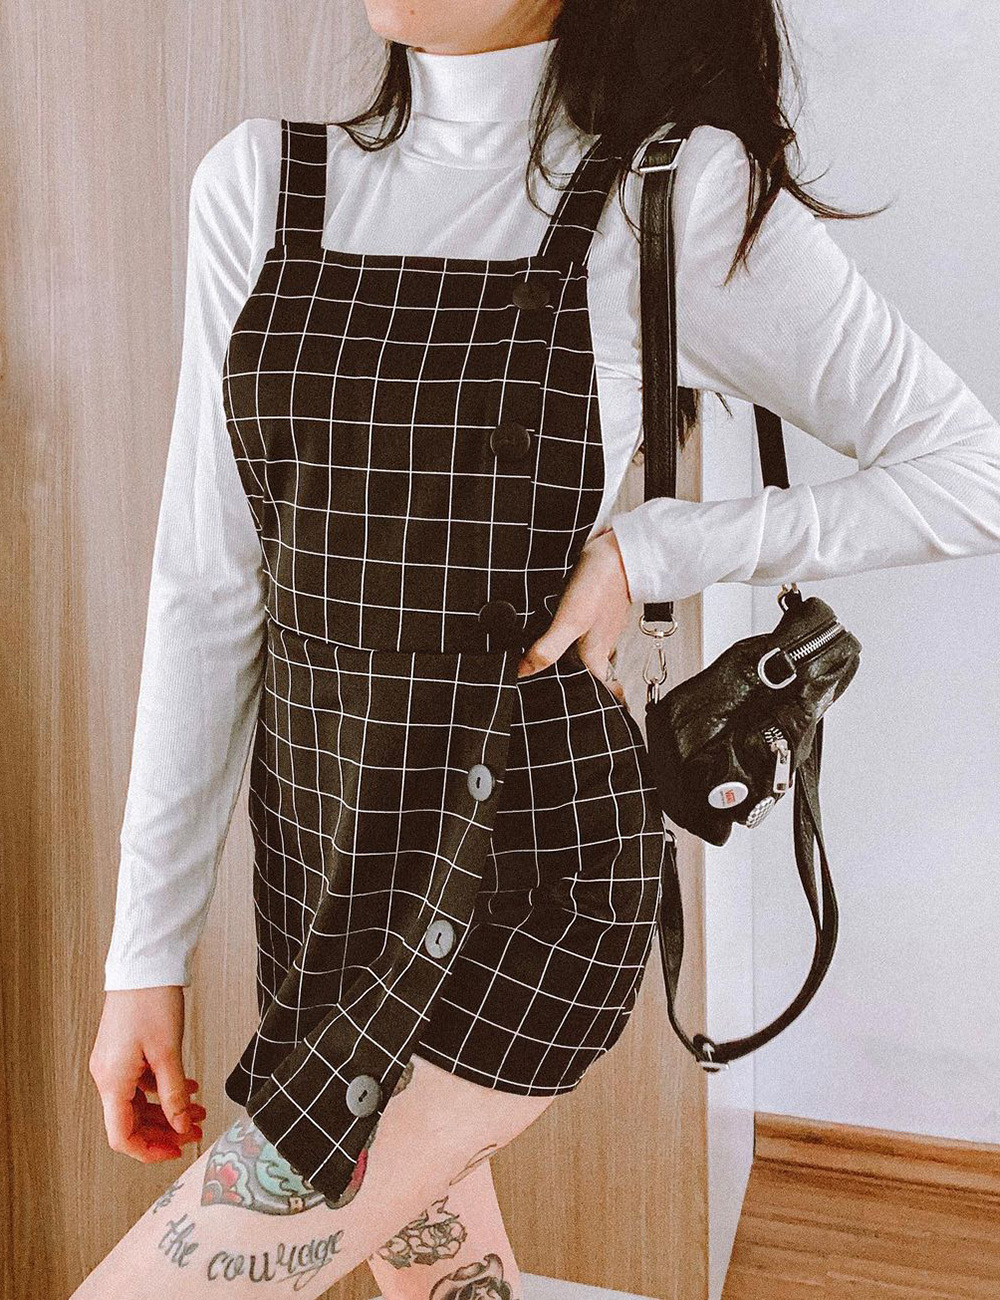 jardineira xadrez, blusa de manga branca